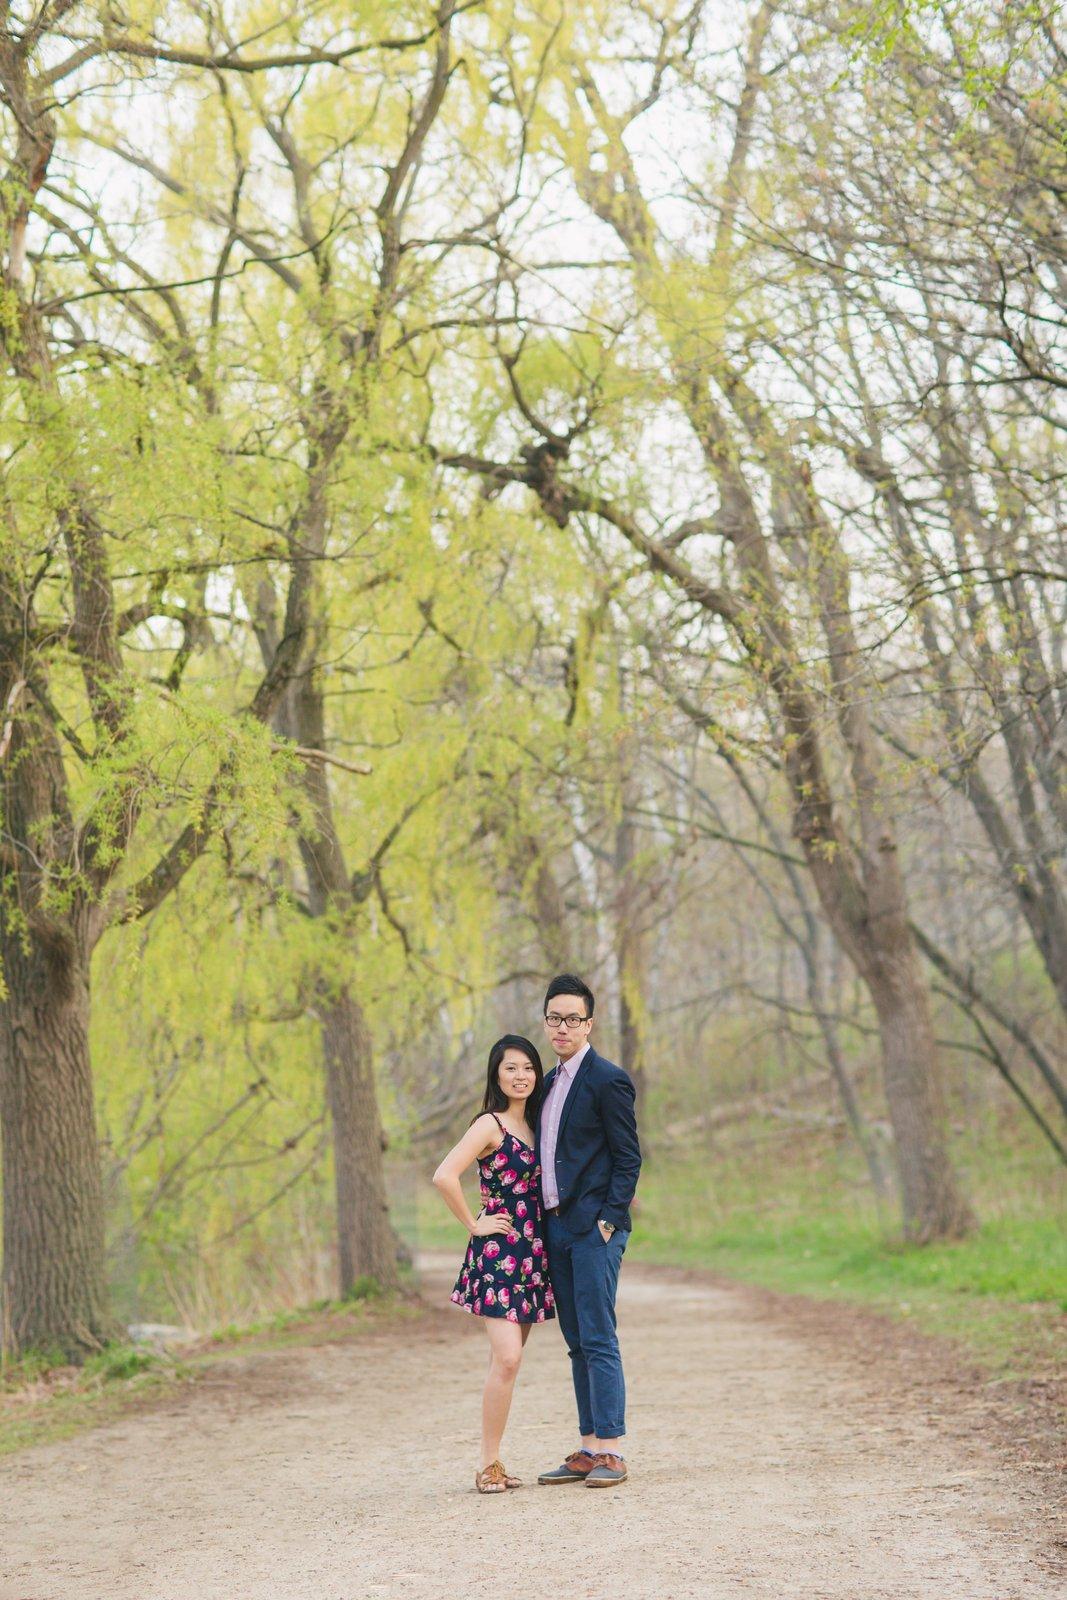 Jessica-Charles-Engagement-High-Park-Cherry-Blossom-003